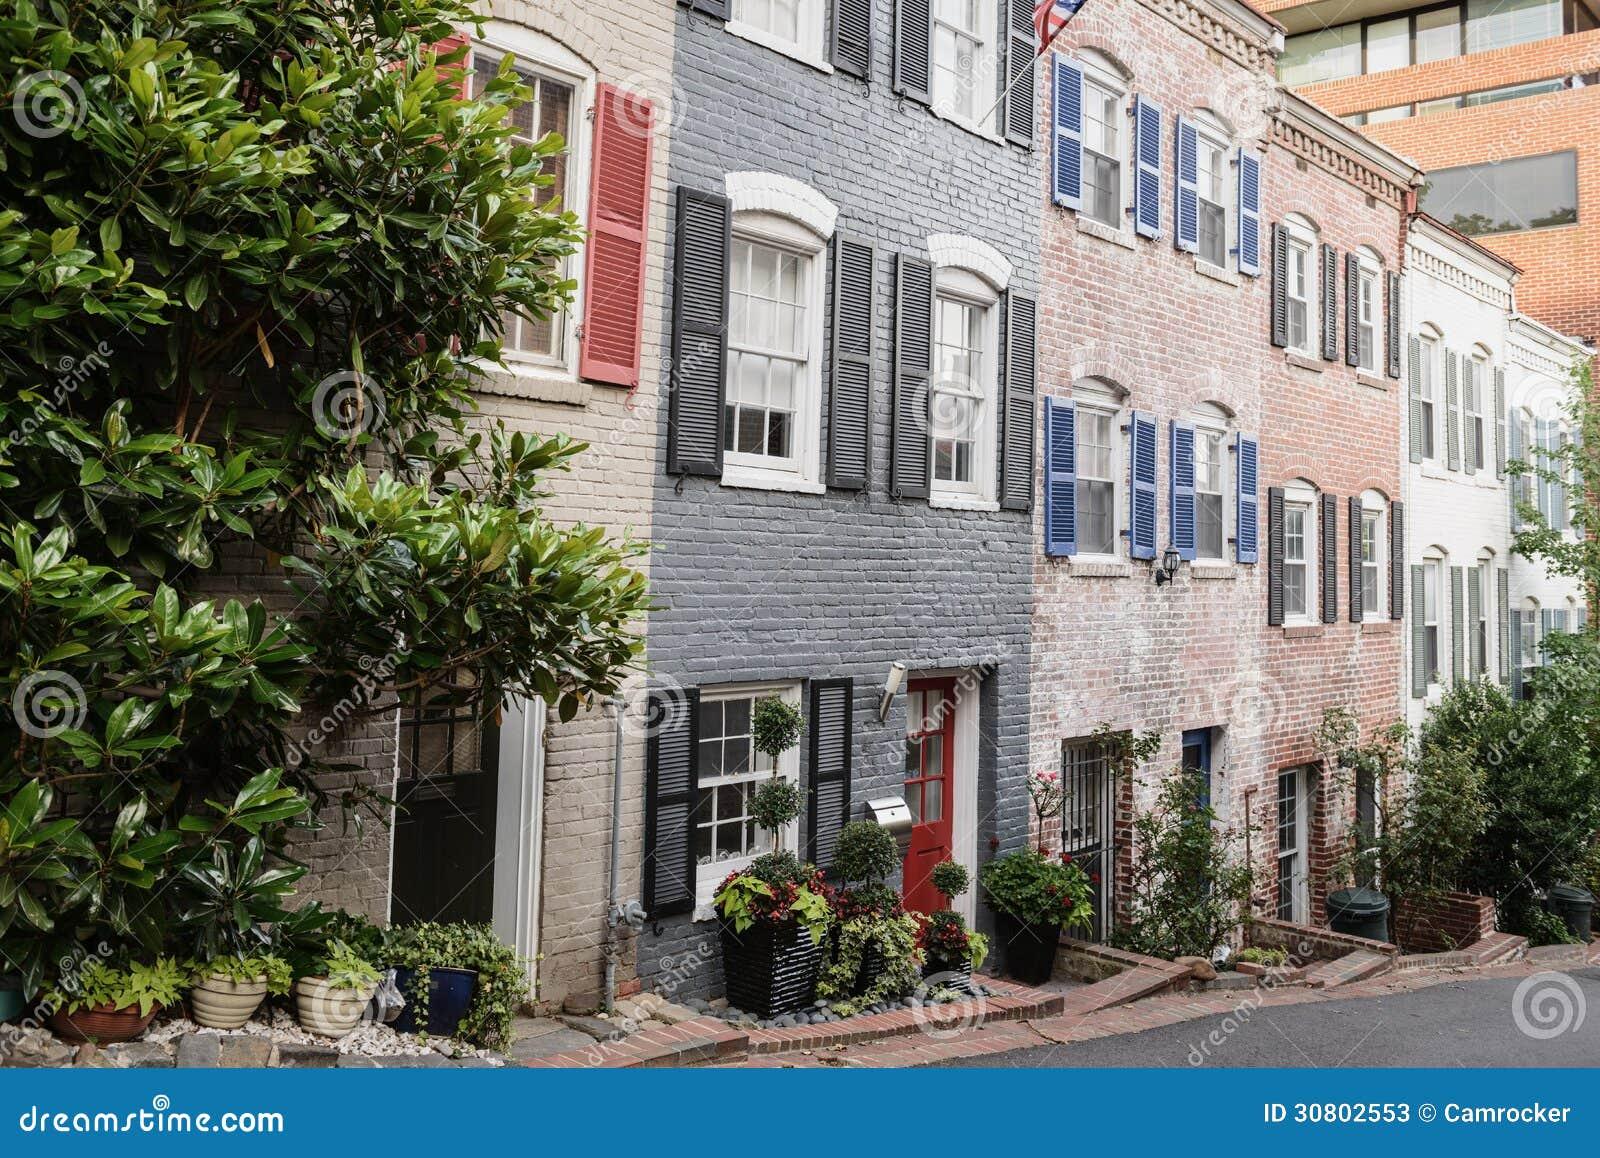 Huizen in de stad in Georgetown, Washington DC